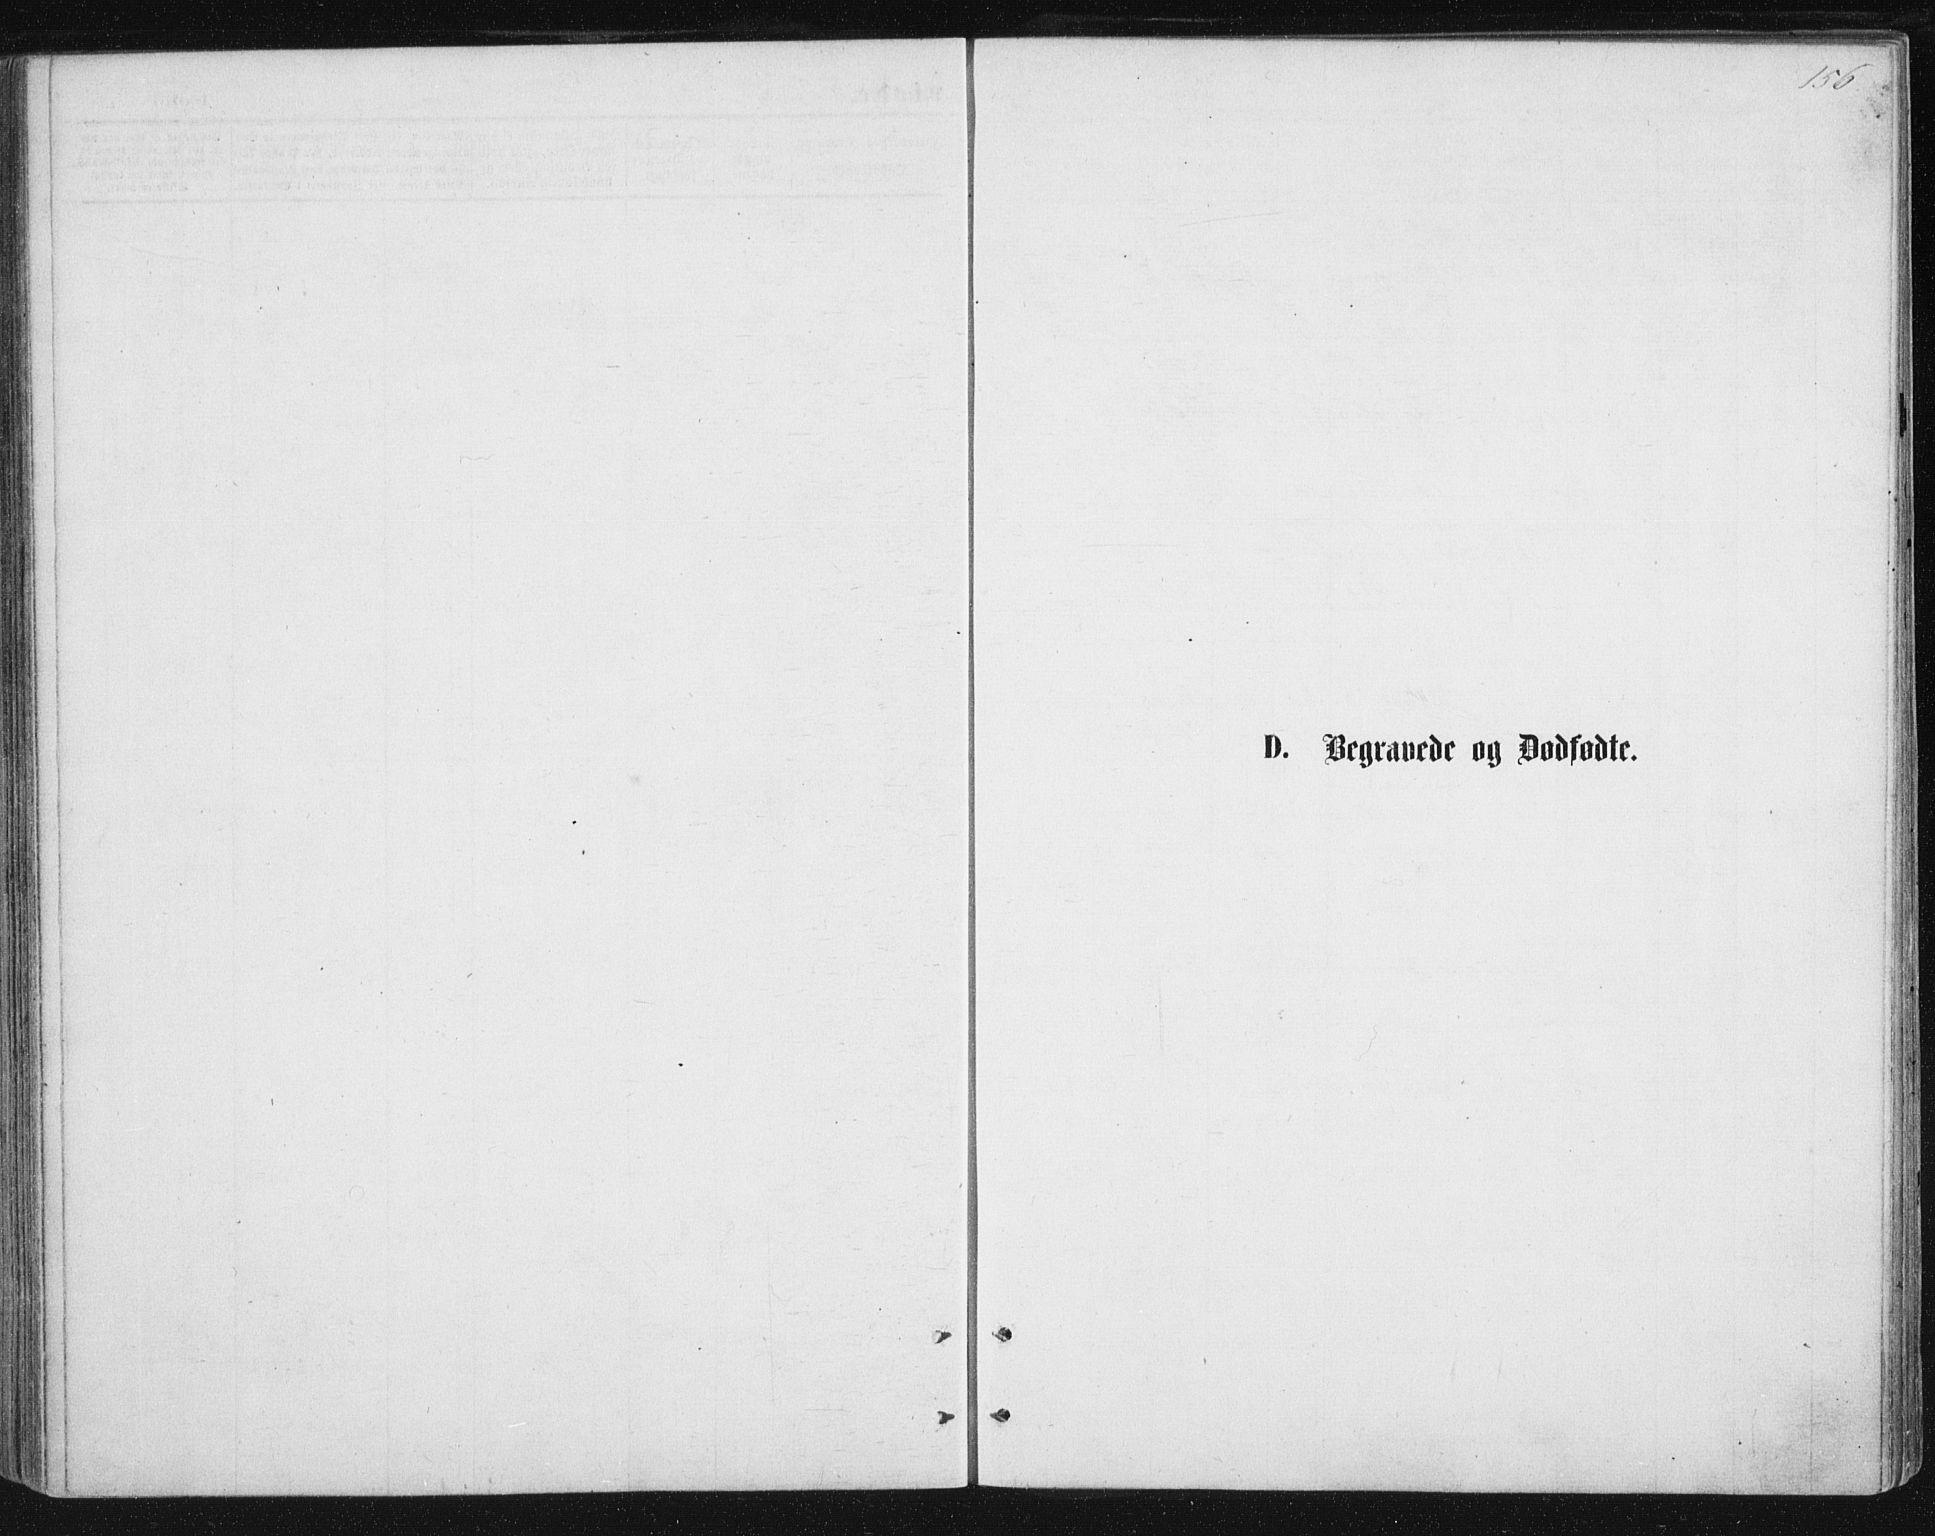 SAT, Ministerialprotokoller, klokkerbøker og fødselsregistre - Nordland, 888/L1243: Ministerialbok nr. 888A09, 1876-1879, s. 156